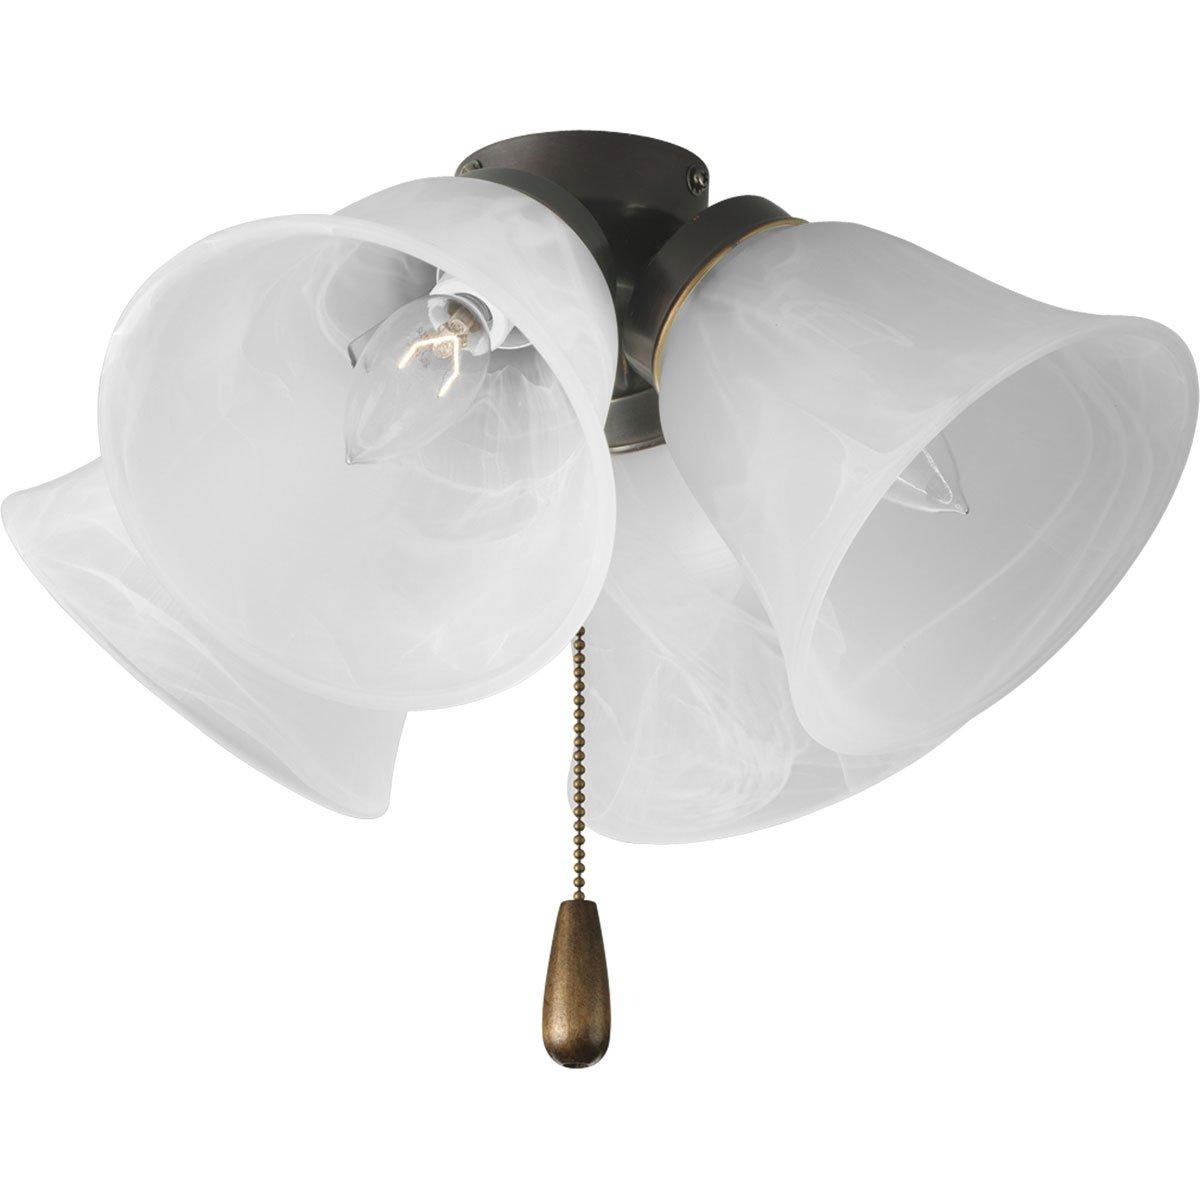 Progress lighting p2643 20 4 light universal fan light kit progress lighting p2643 20 4 light universal fan light kit antique bronze ceiling fan light kits amazon mozeypictures Choice Image